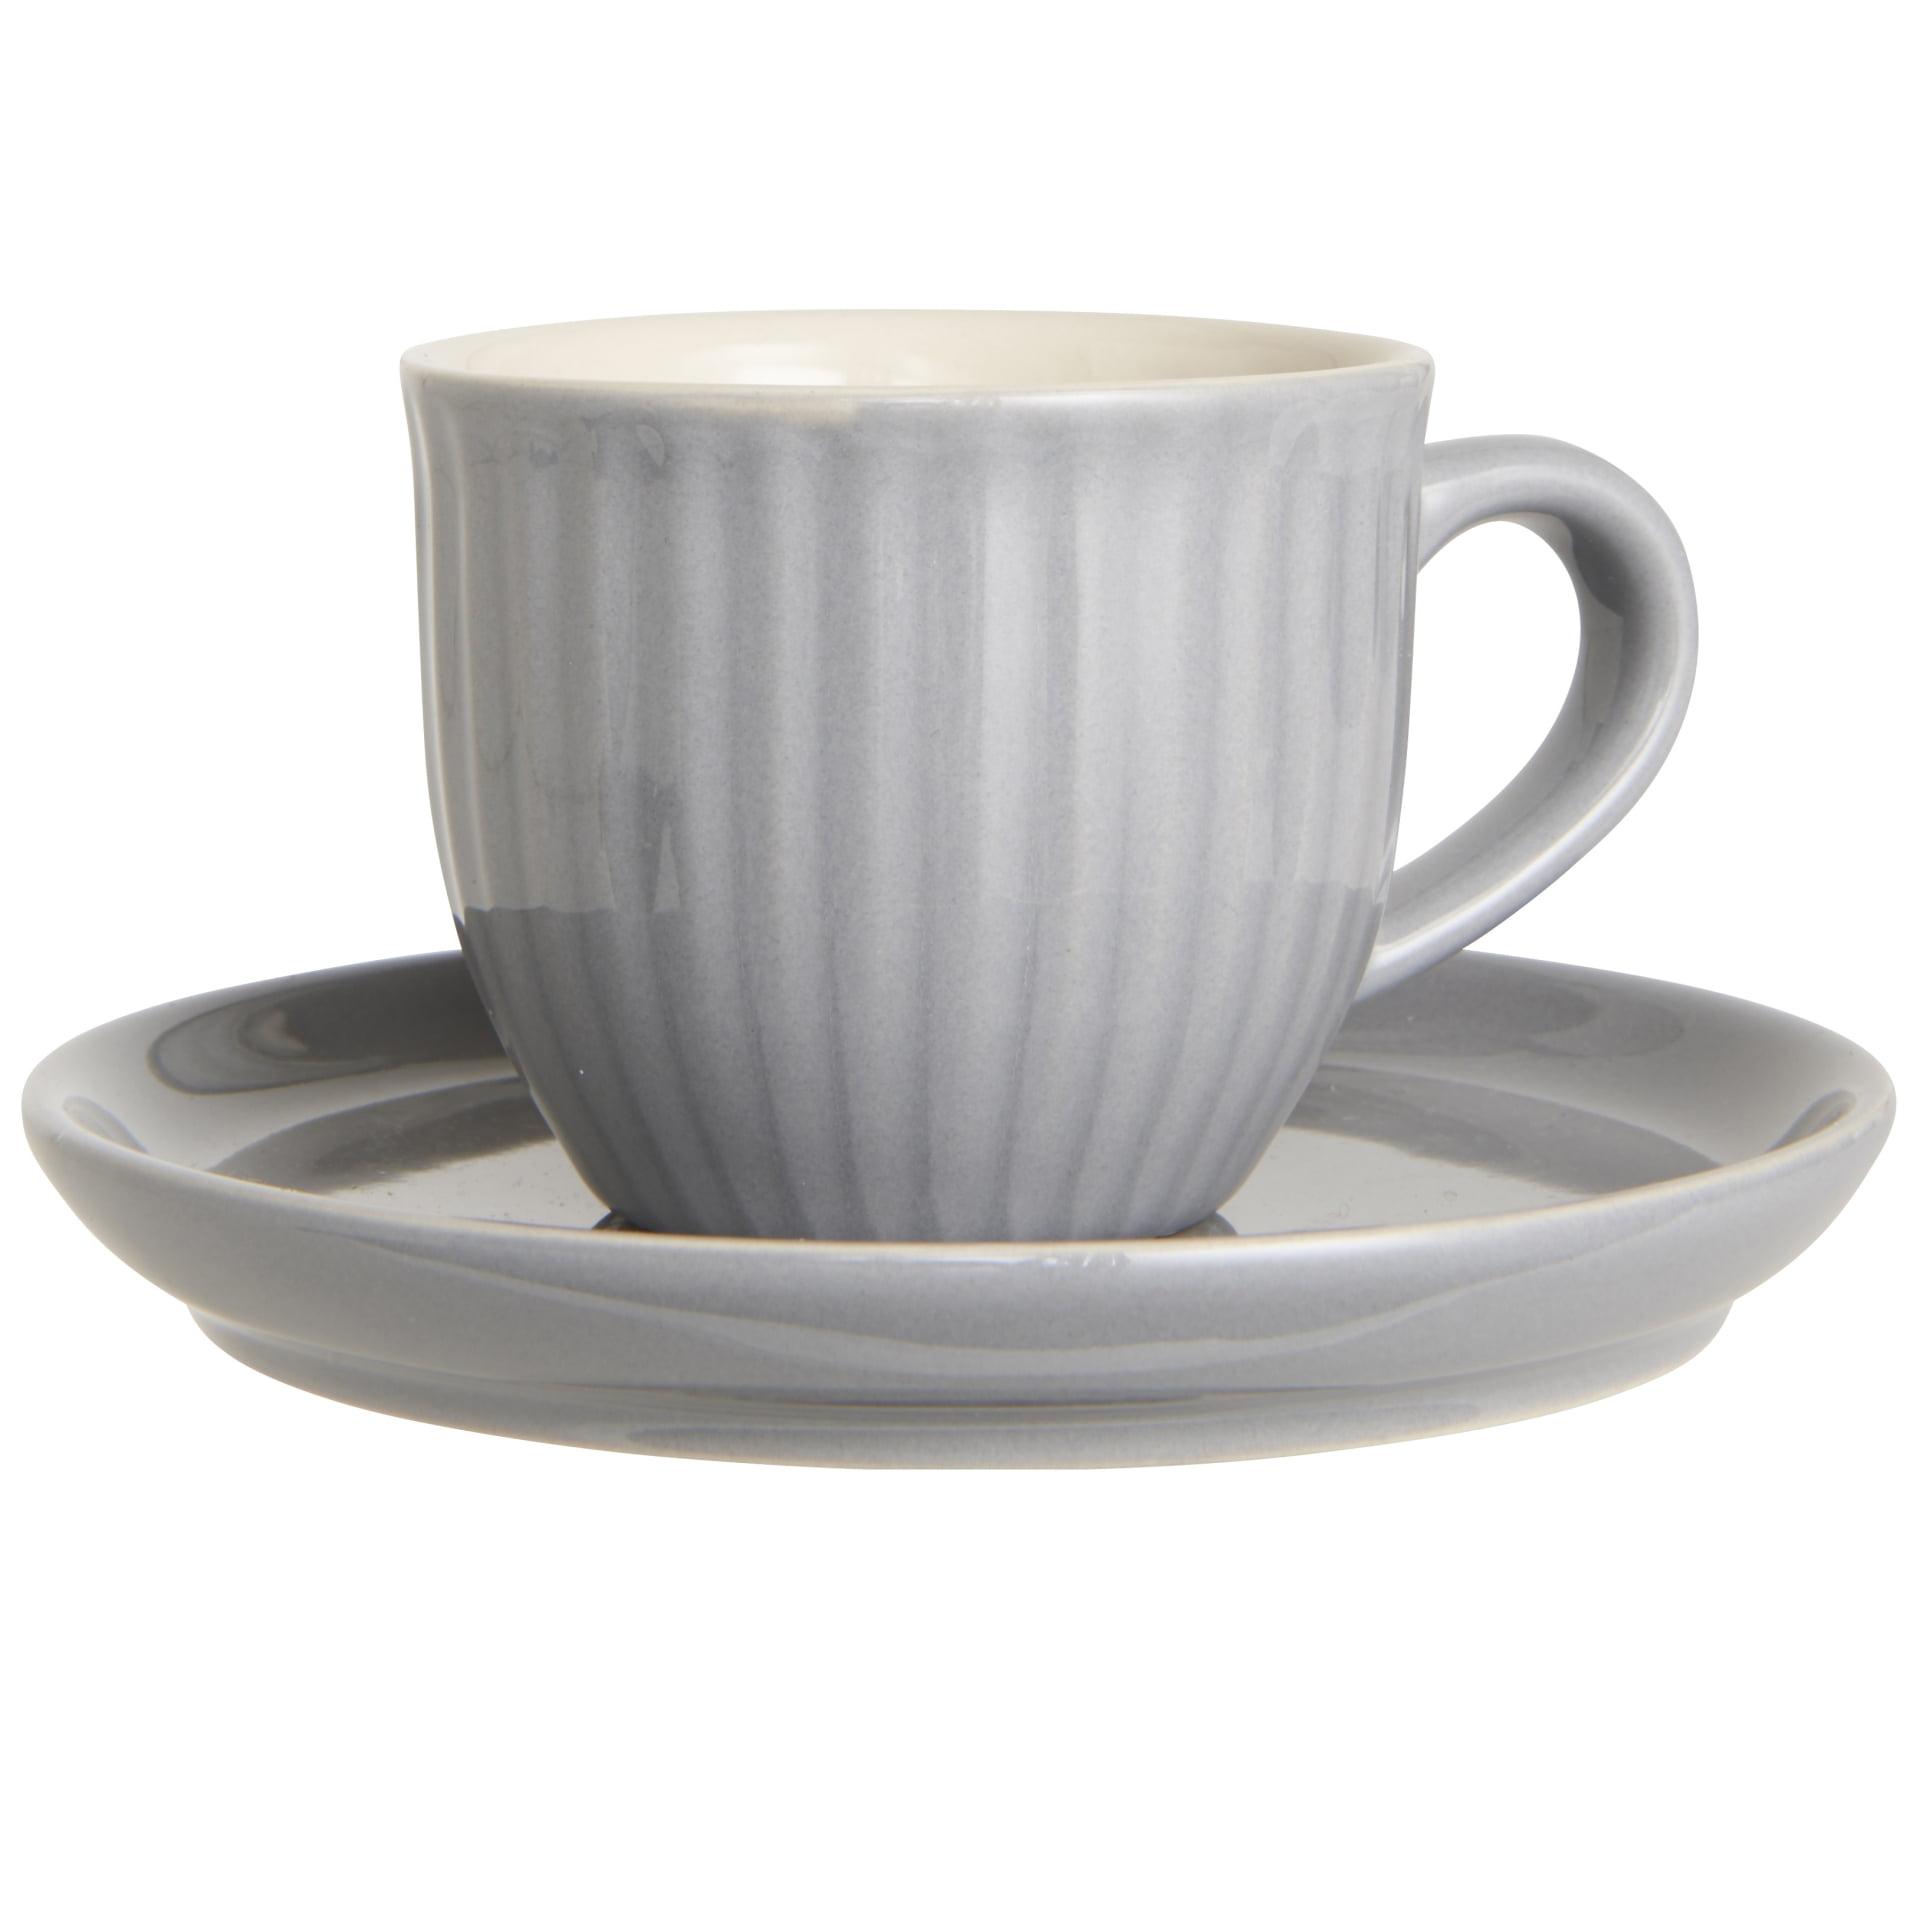 IB LAURSEN Šálek s podšálkem Mynte French Grey 135 ml, šedá barva, keramika